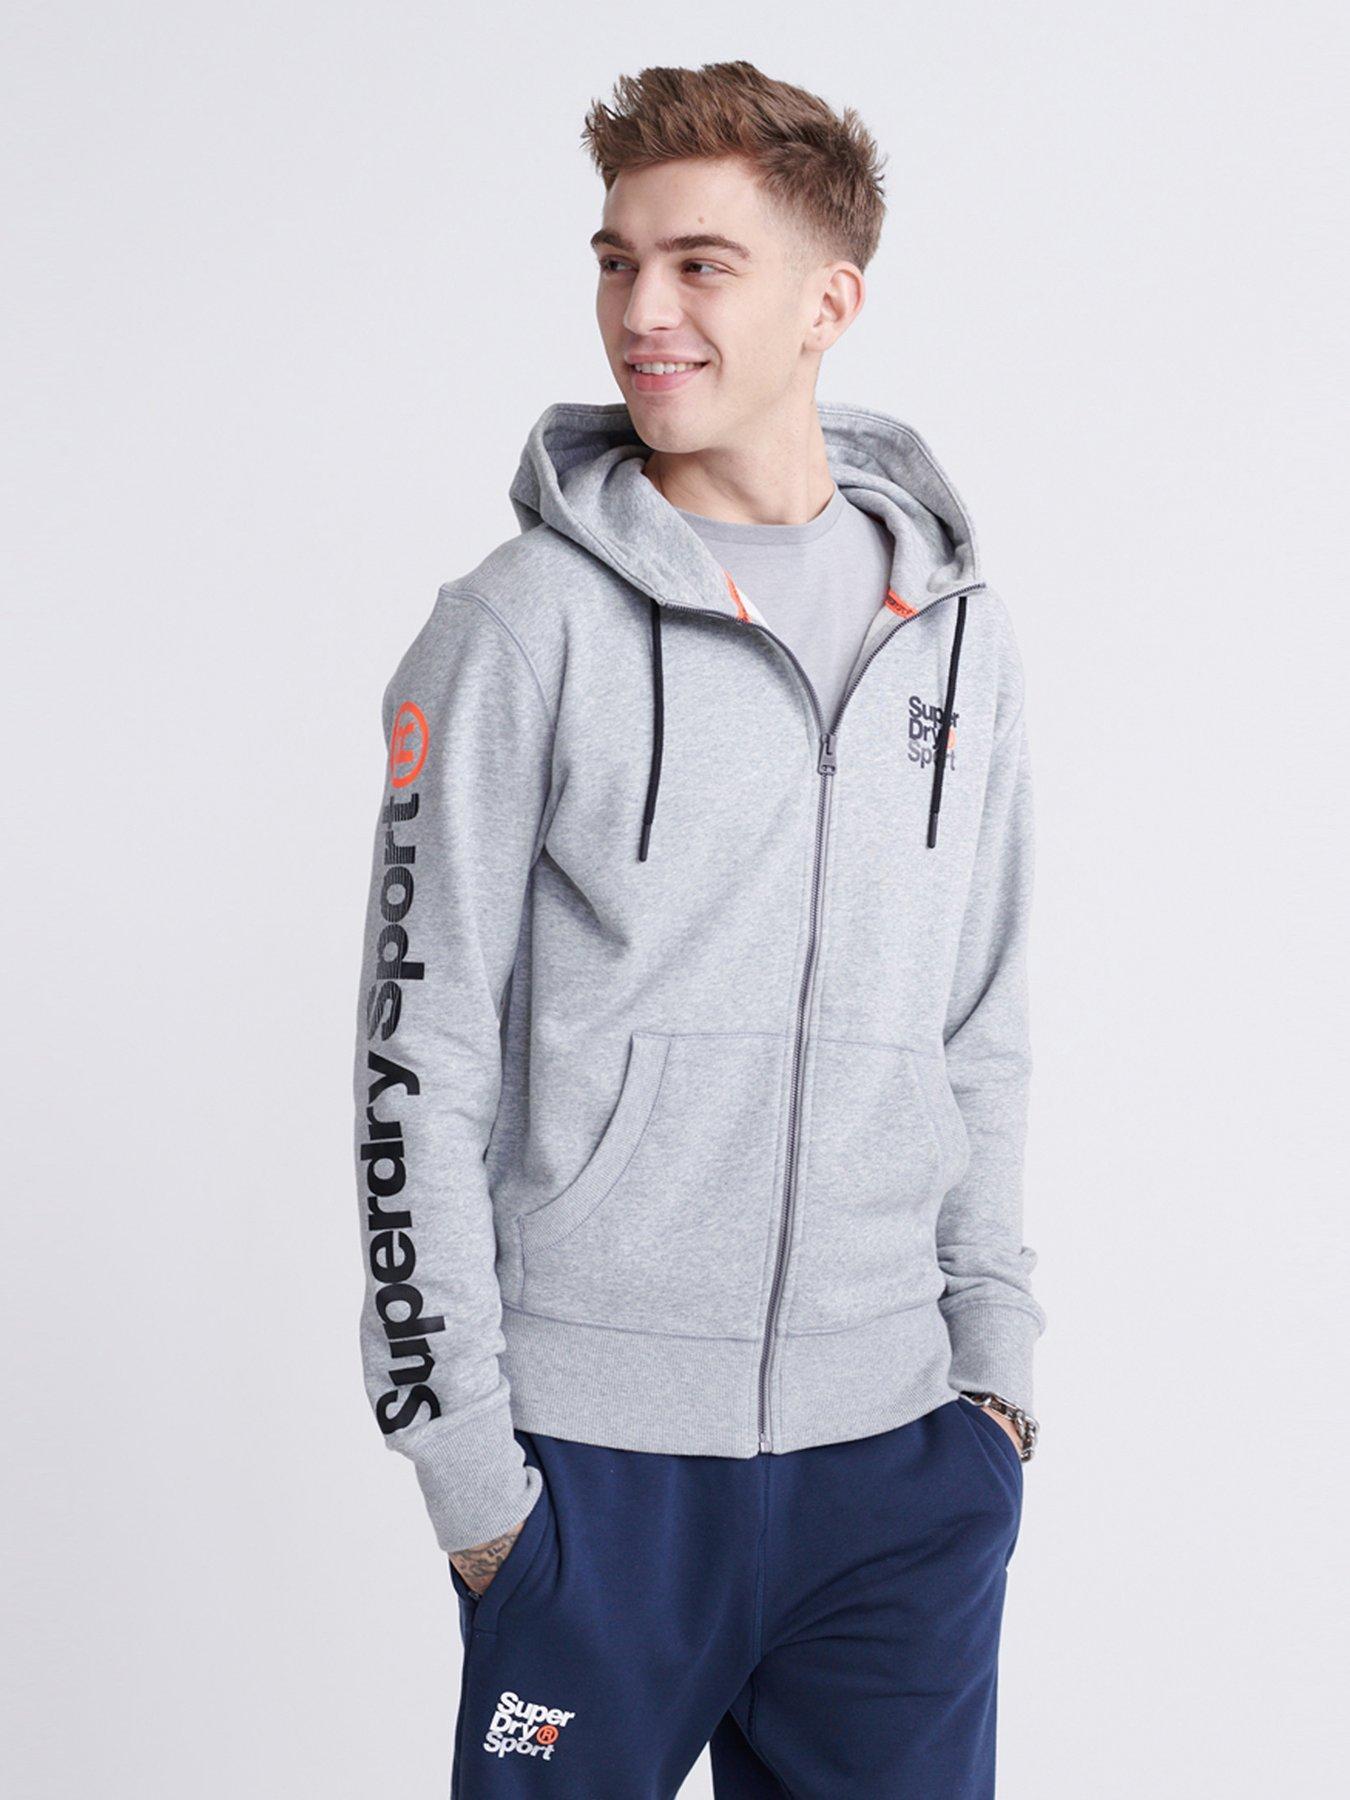 Brand New Joe Browns Men/'s Appliqué Washed Blue Sweatshirt RRP £39 Sizes S-XXL